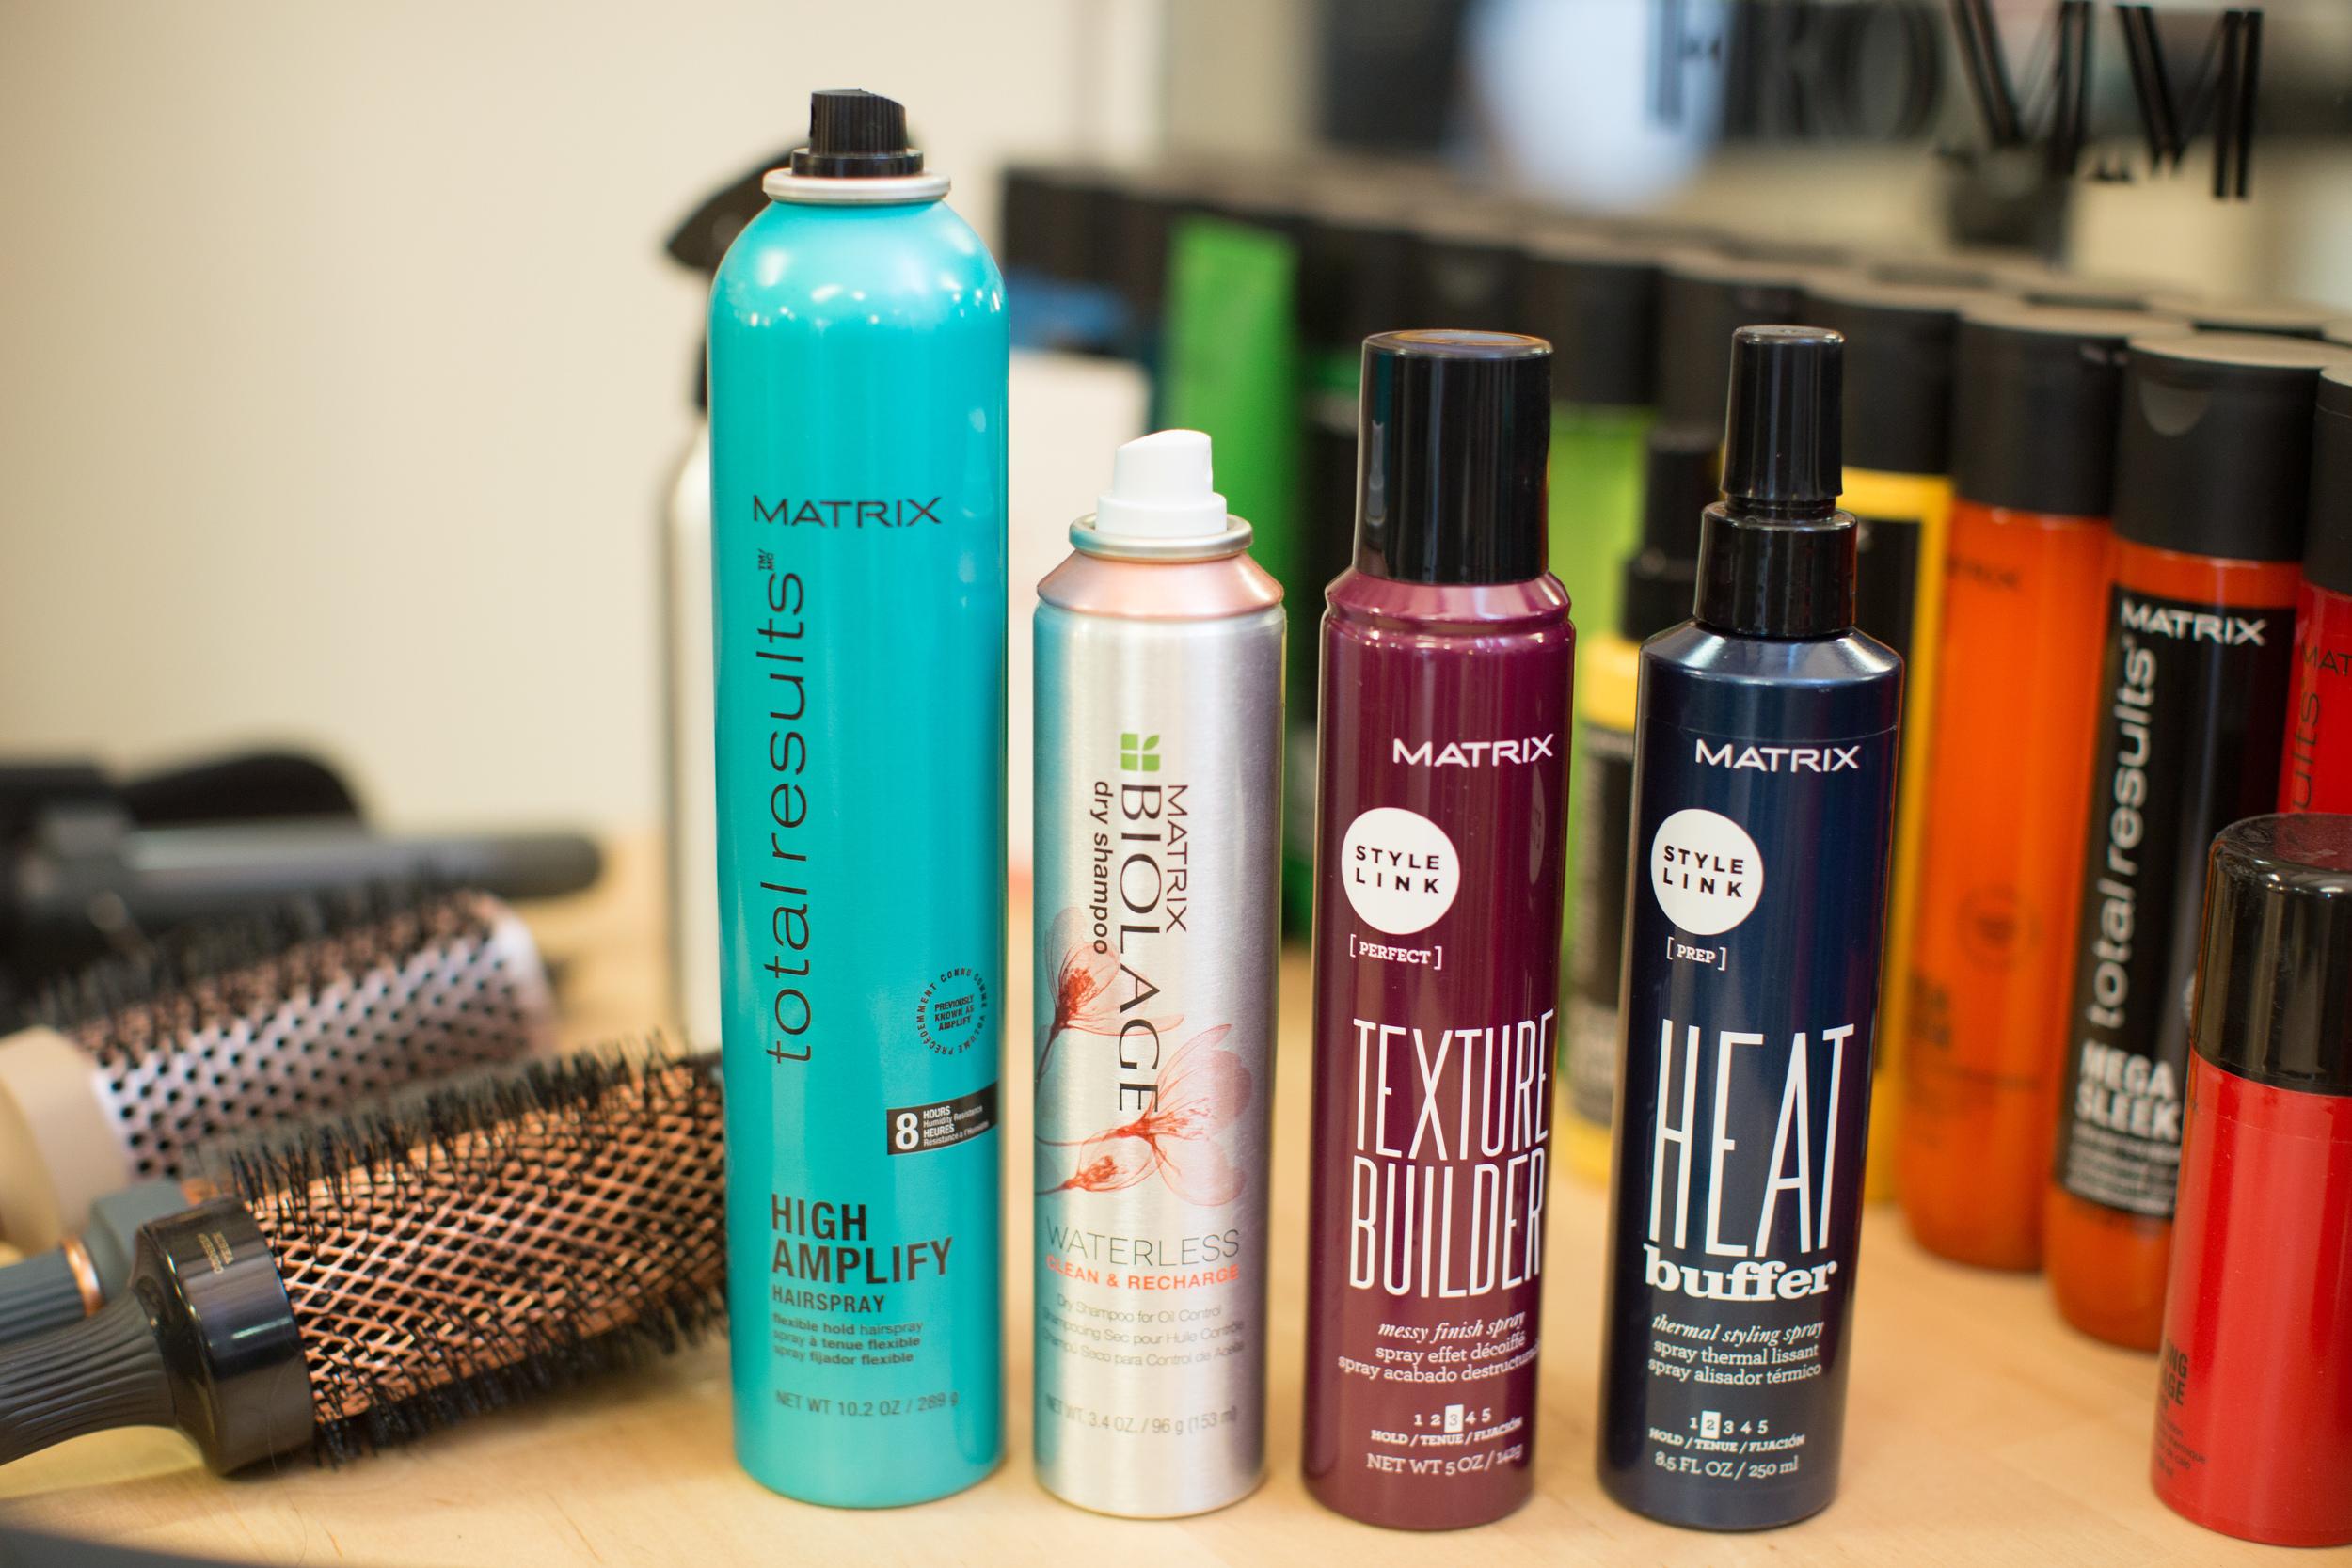 Left to right:  1.  Matrix Total Results High Amplify Hairspray Flexible Hold Hairspray   2.  Matrix Biolage Waterless Dry Shampoo   3.  Matrix StyleLink Texture Builder   4.  Matrix StyleLink Heat Buffer